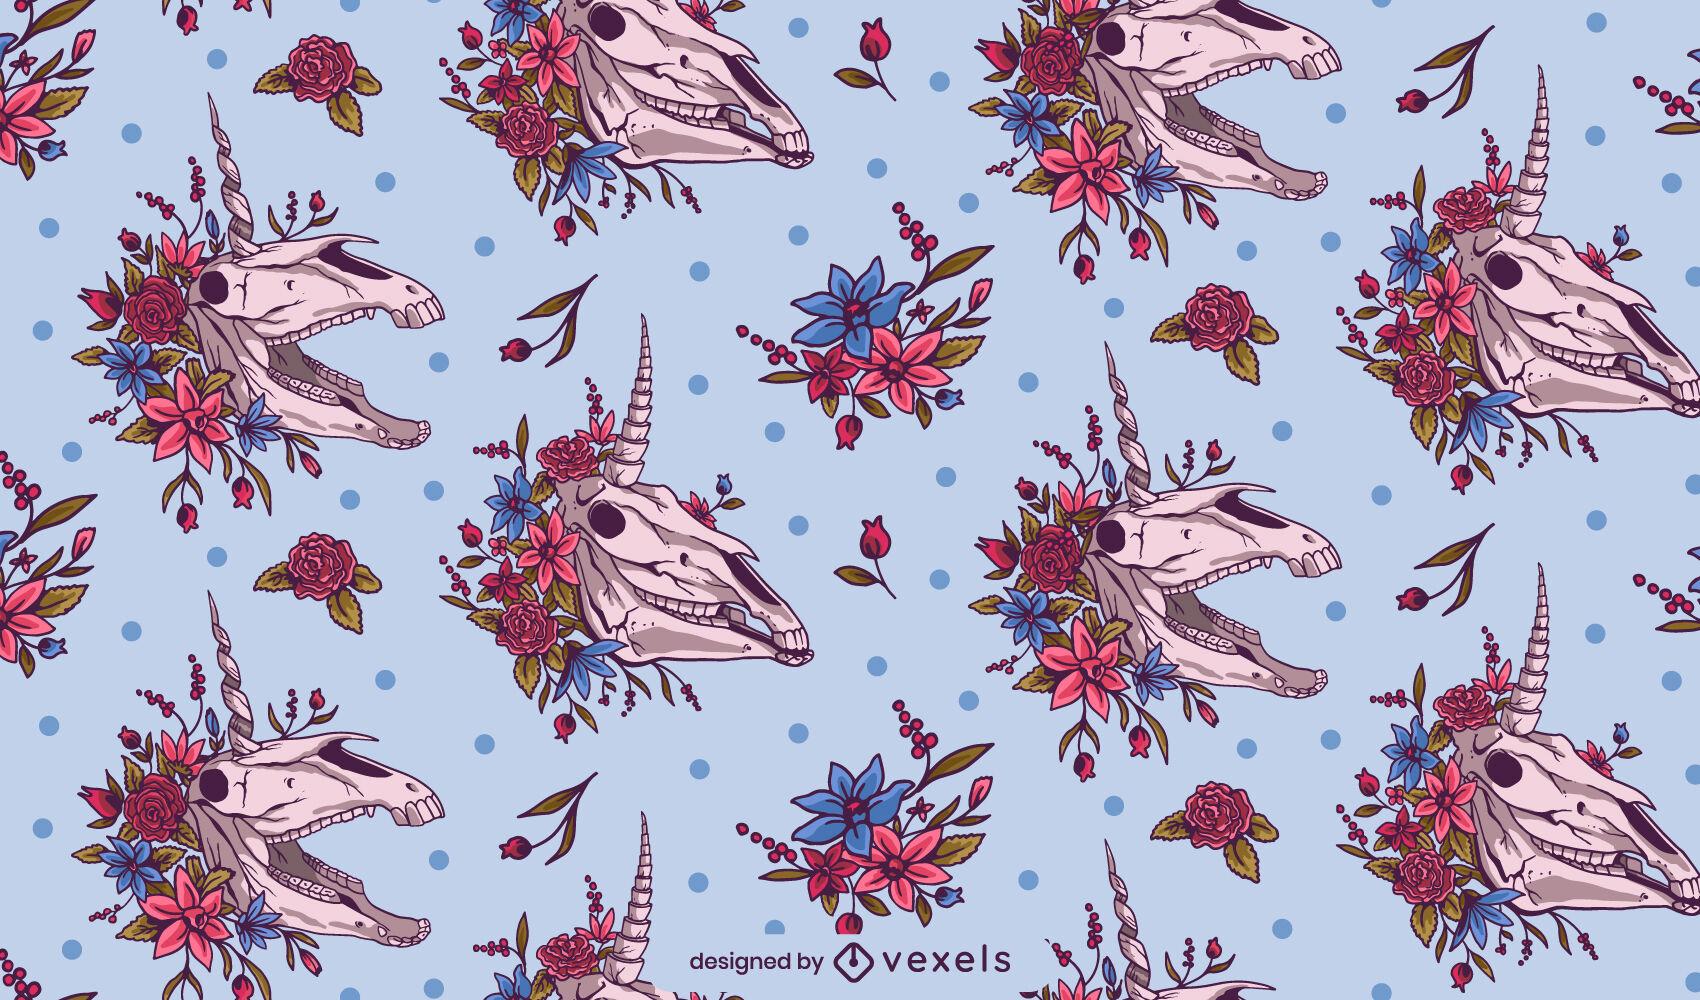 Floral unicorn skuls nature pattern design